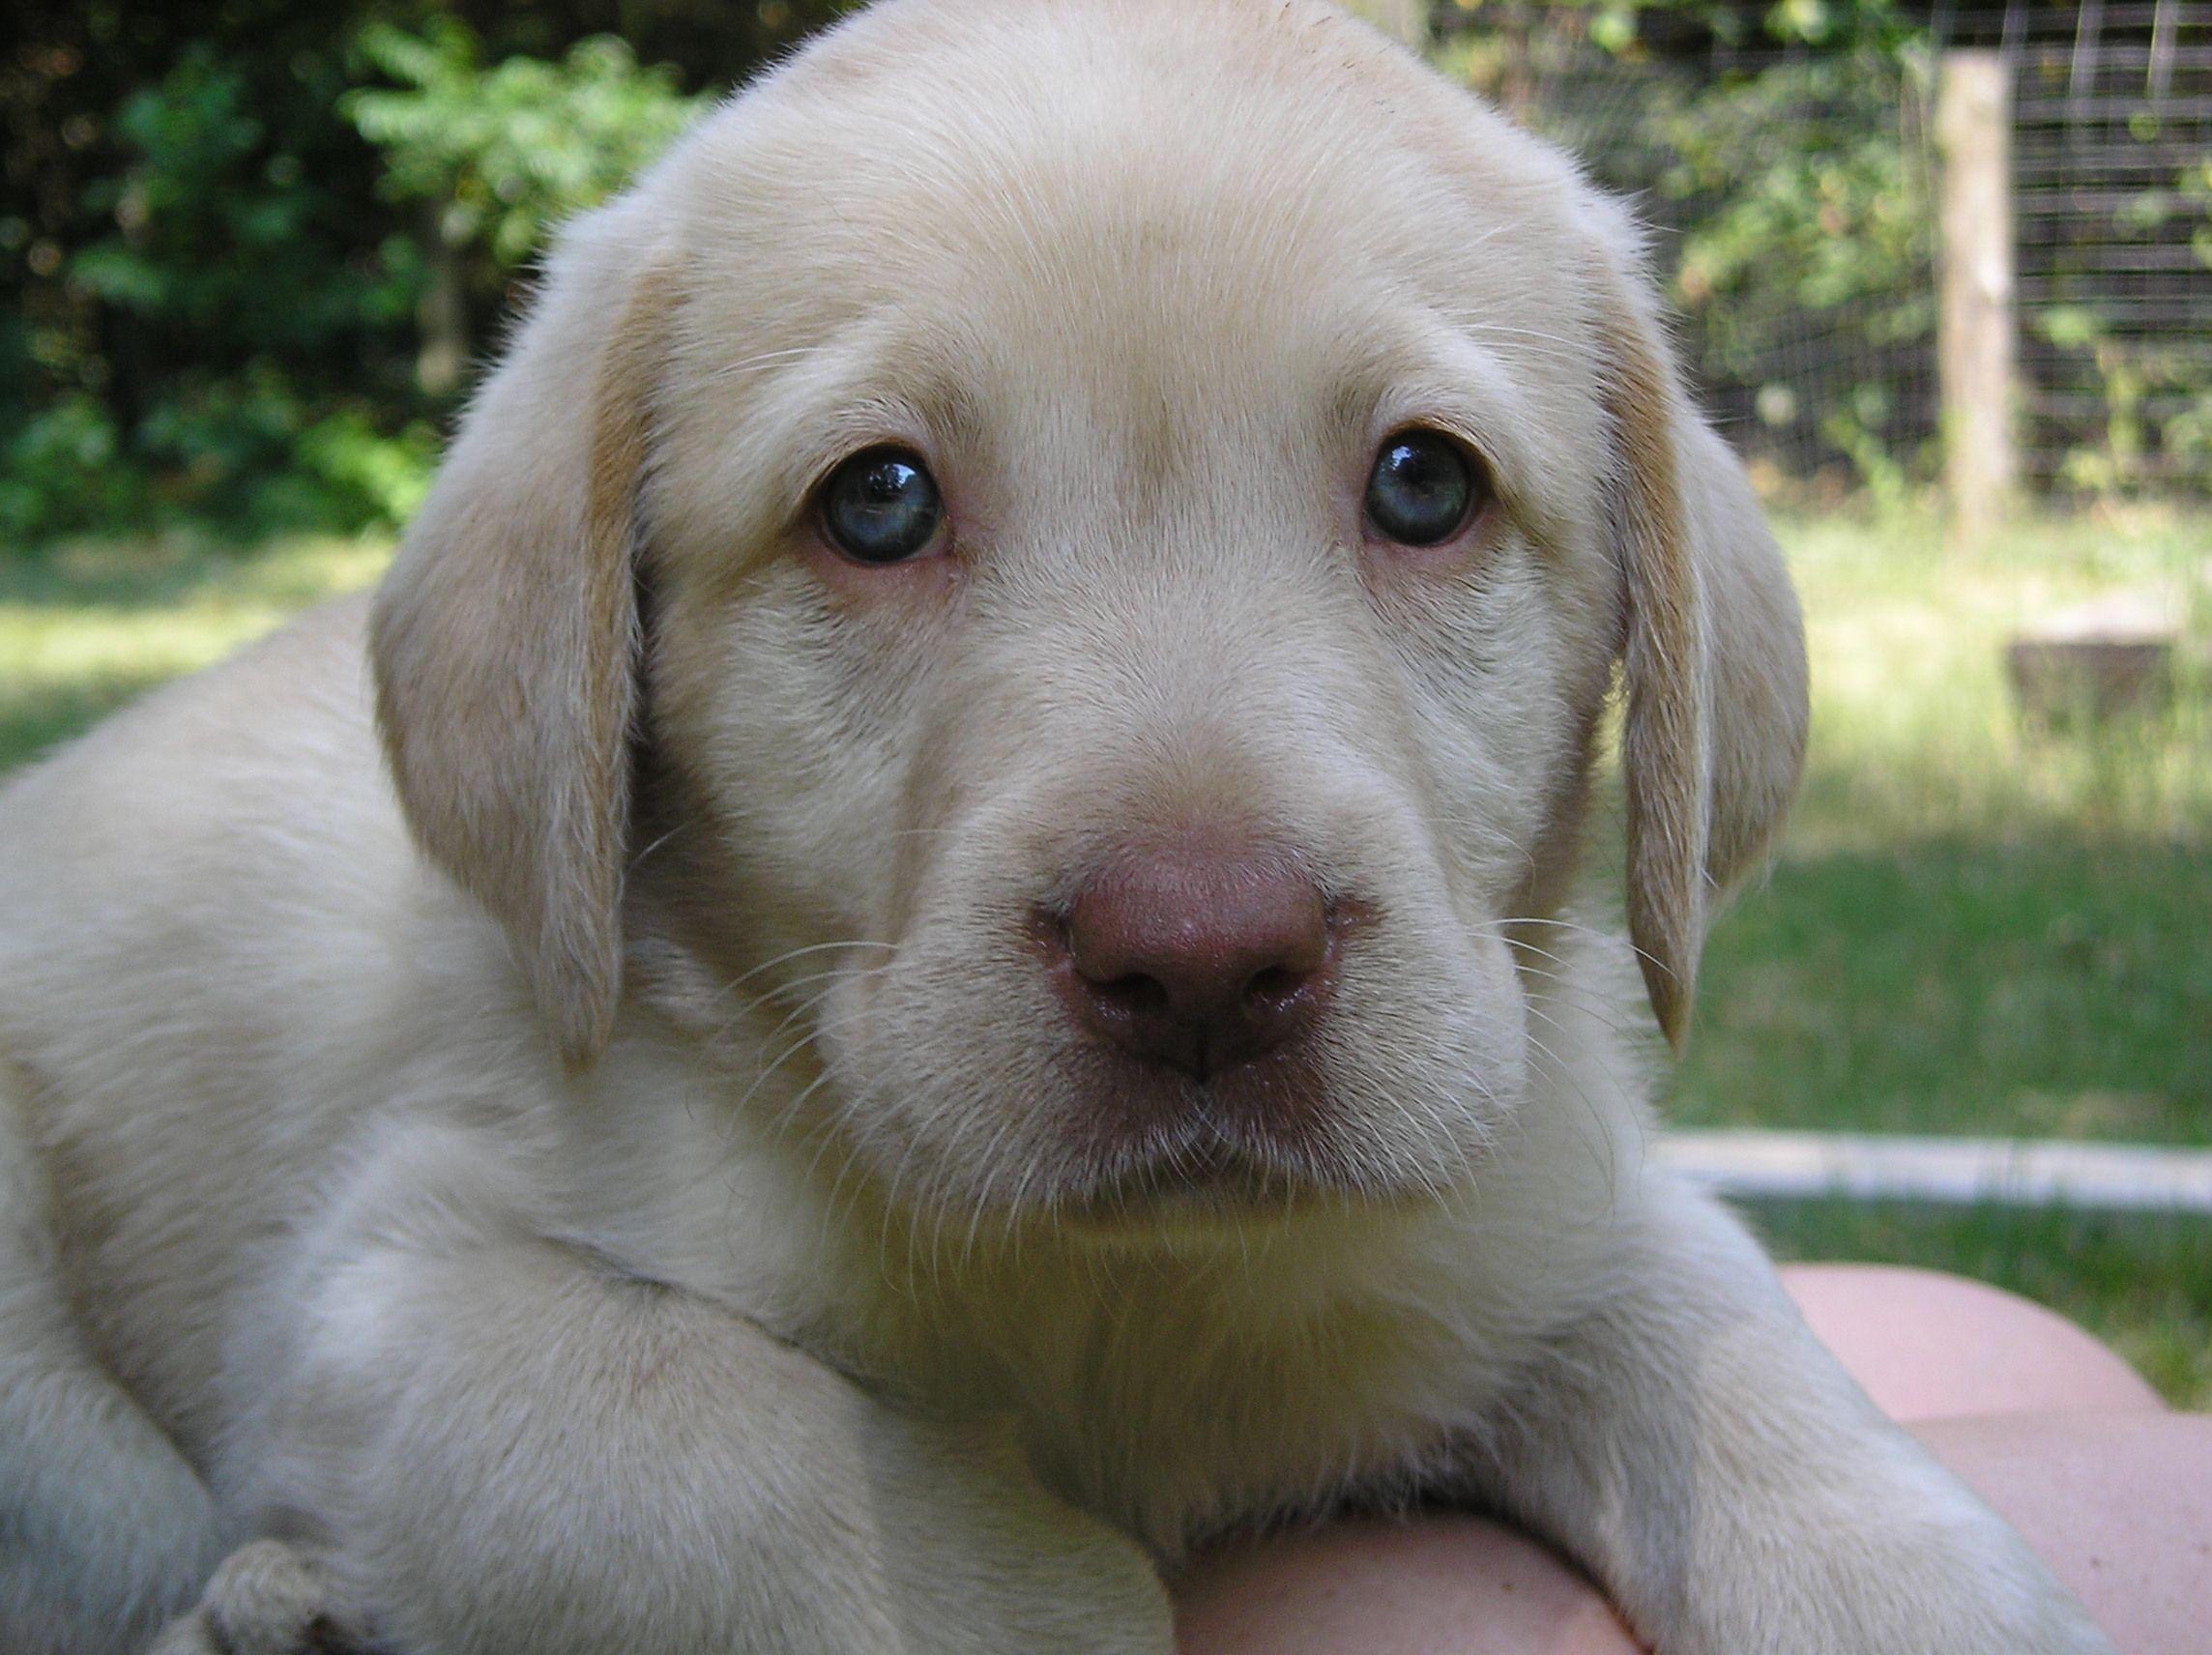 Dudley Lab Google Search Labrador Retriever Black Labrador Retriever Puppies With Blue Eyes